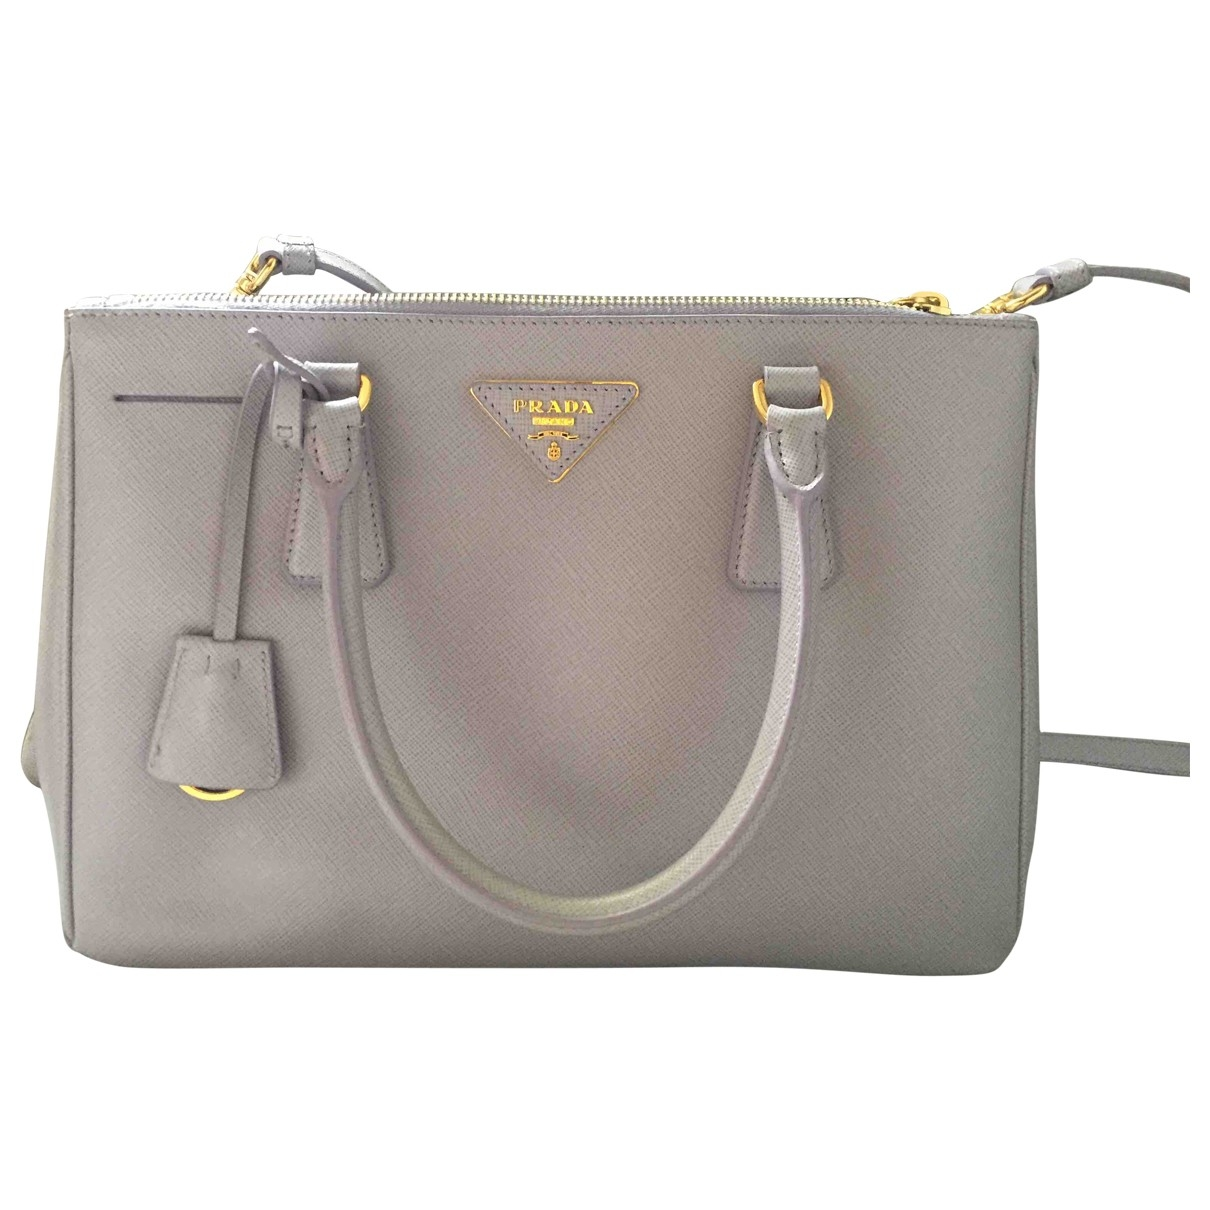 Prada saffiano  Handtasche in  Grau Leder